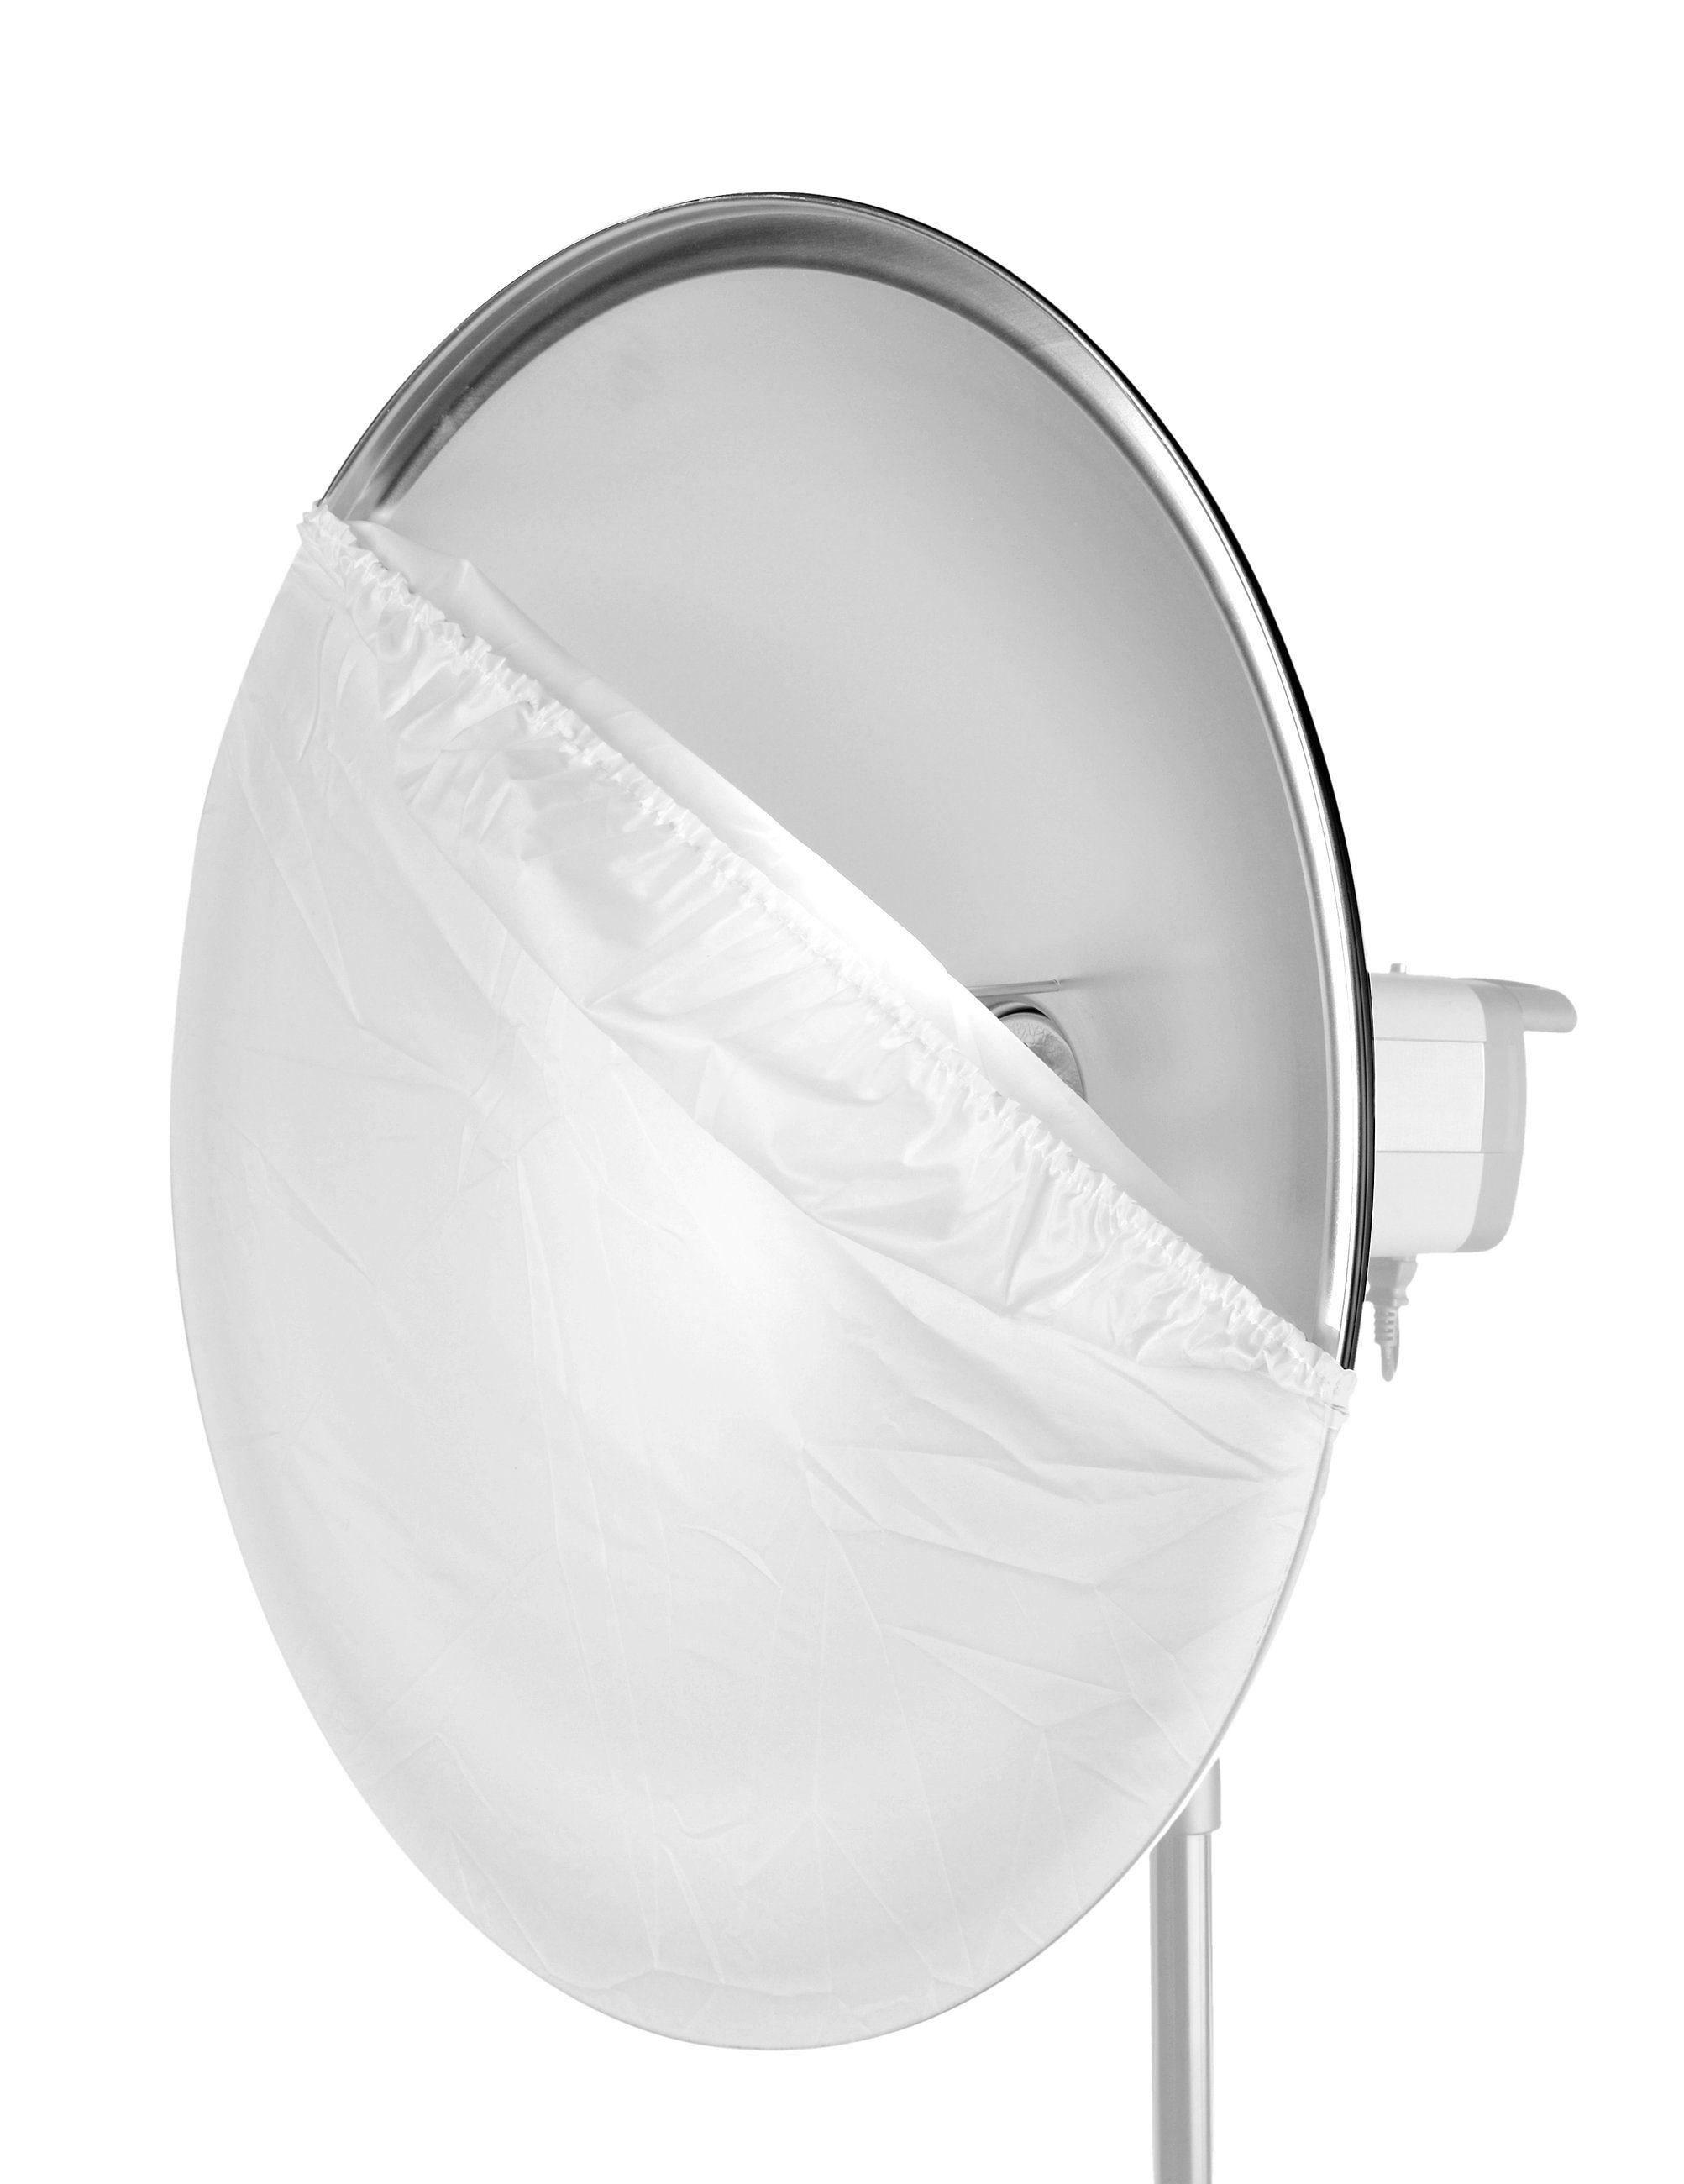 BRESSER Fotostudio »BRESSER M-18 Super Beauty Dish 70,5 cm«